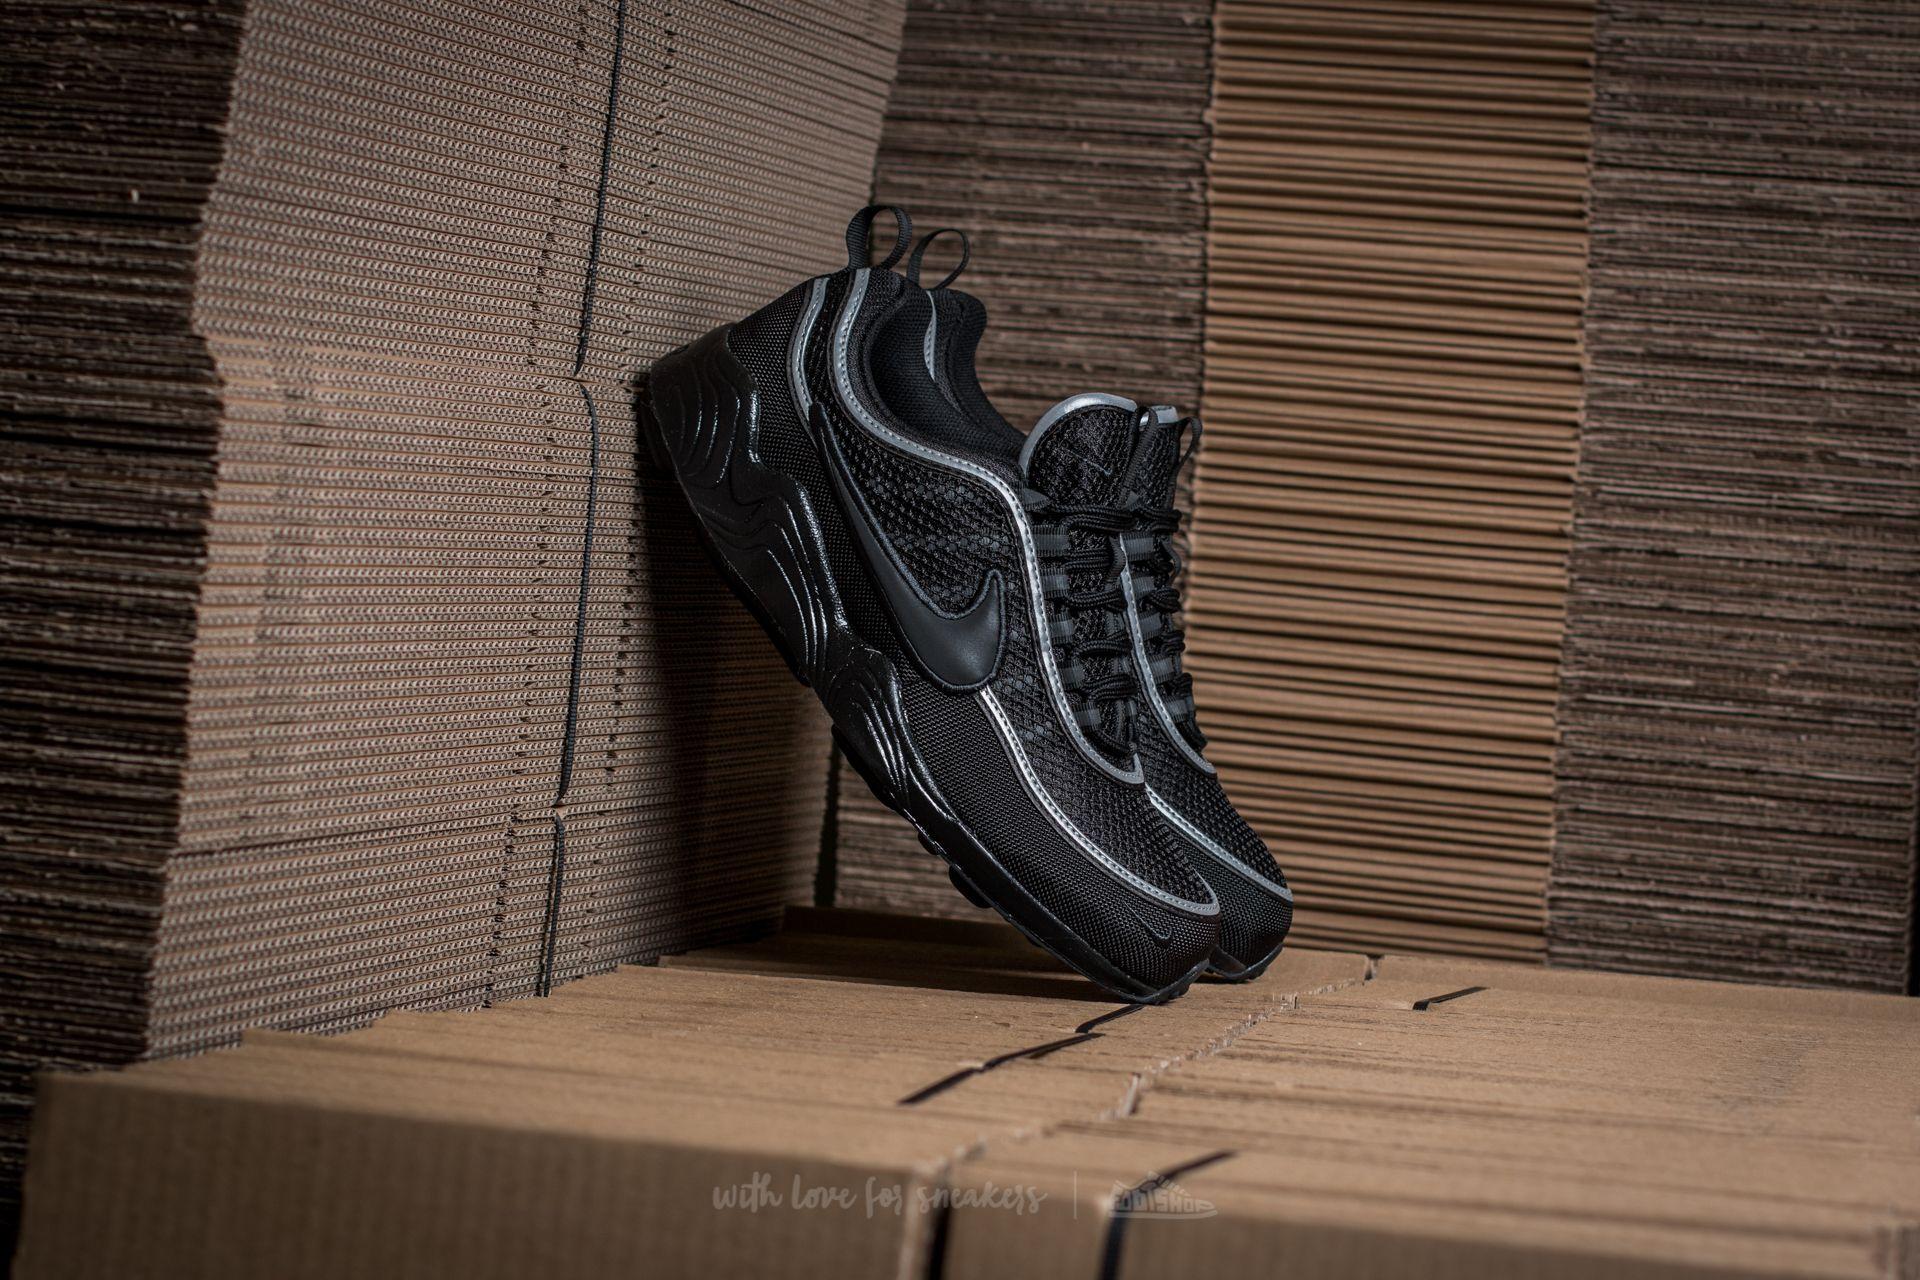 cemento Milagroso Casarse  Men's shoes Nike Air Zoom Spiridon ´16 Black/ Black-Anthracite   Footshop